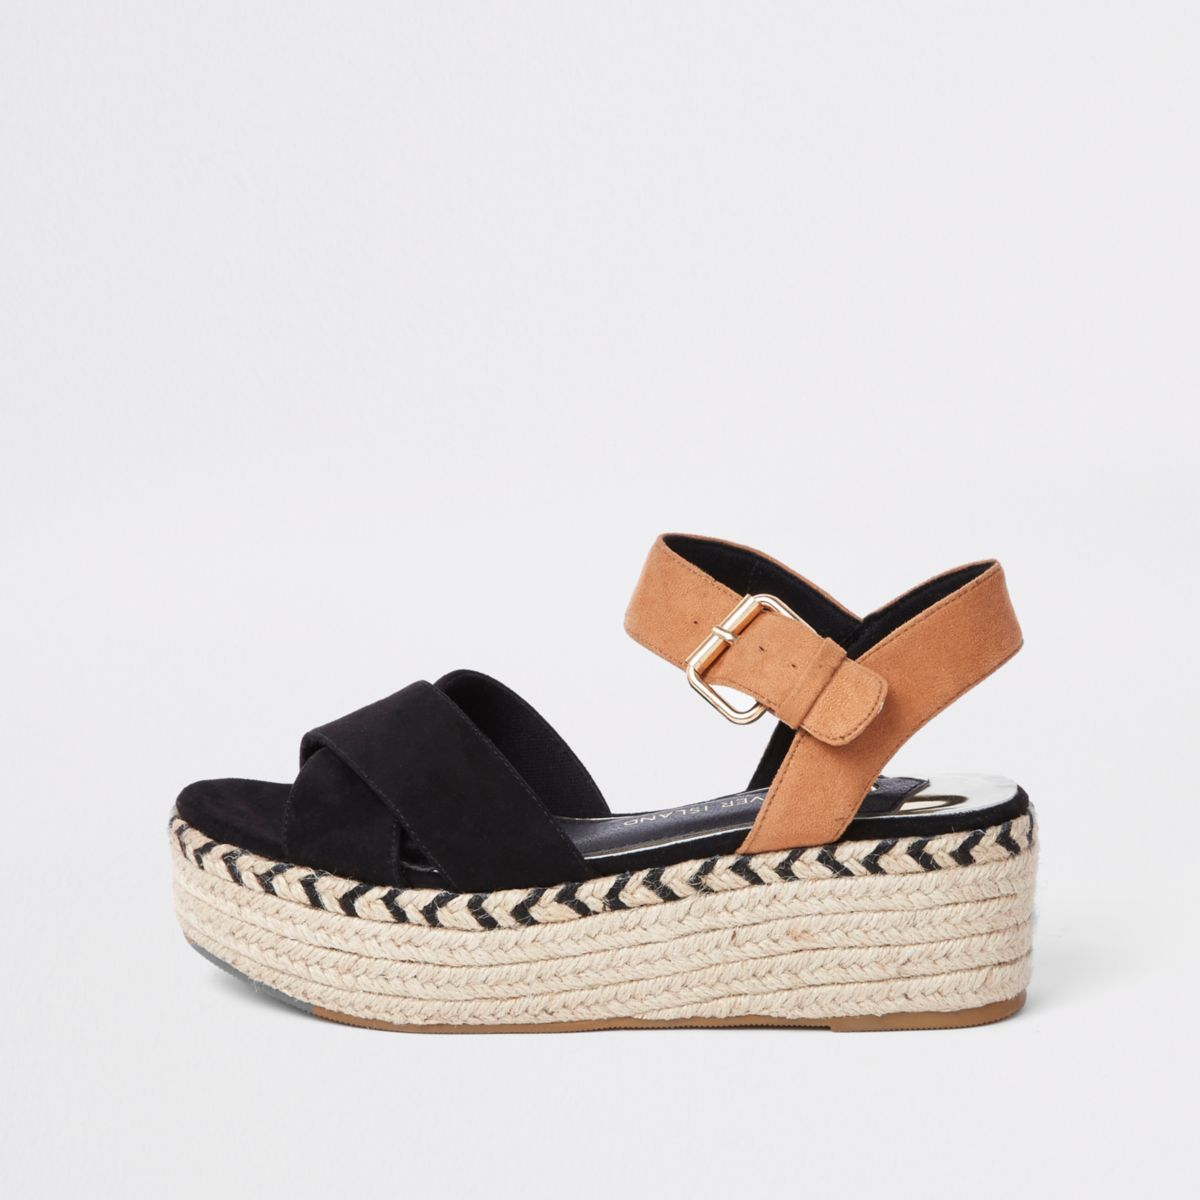 Black contrast espadrille wedge sandals